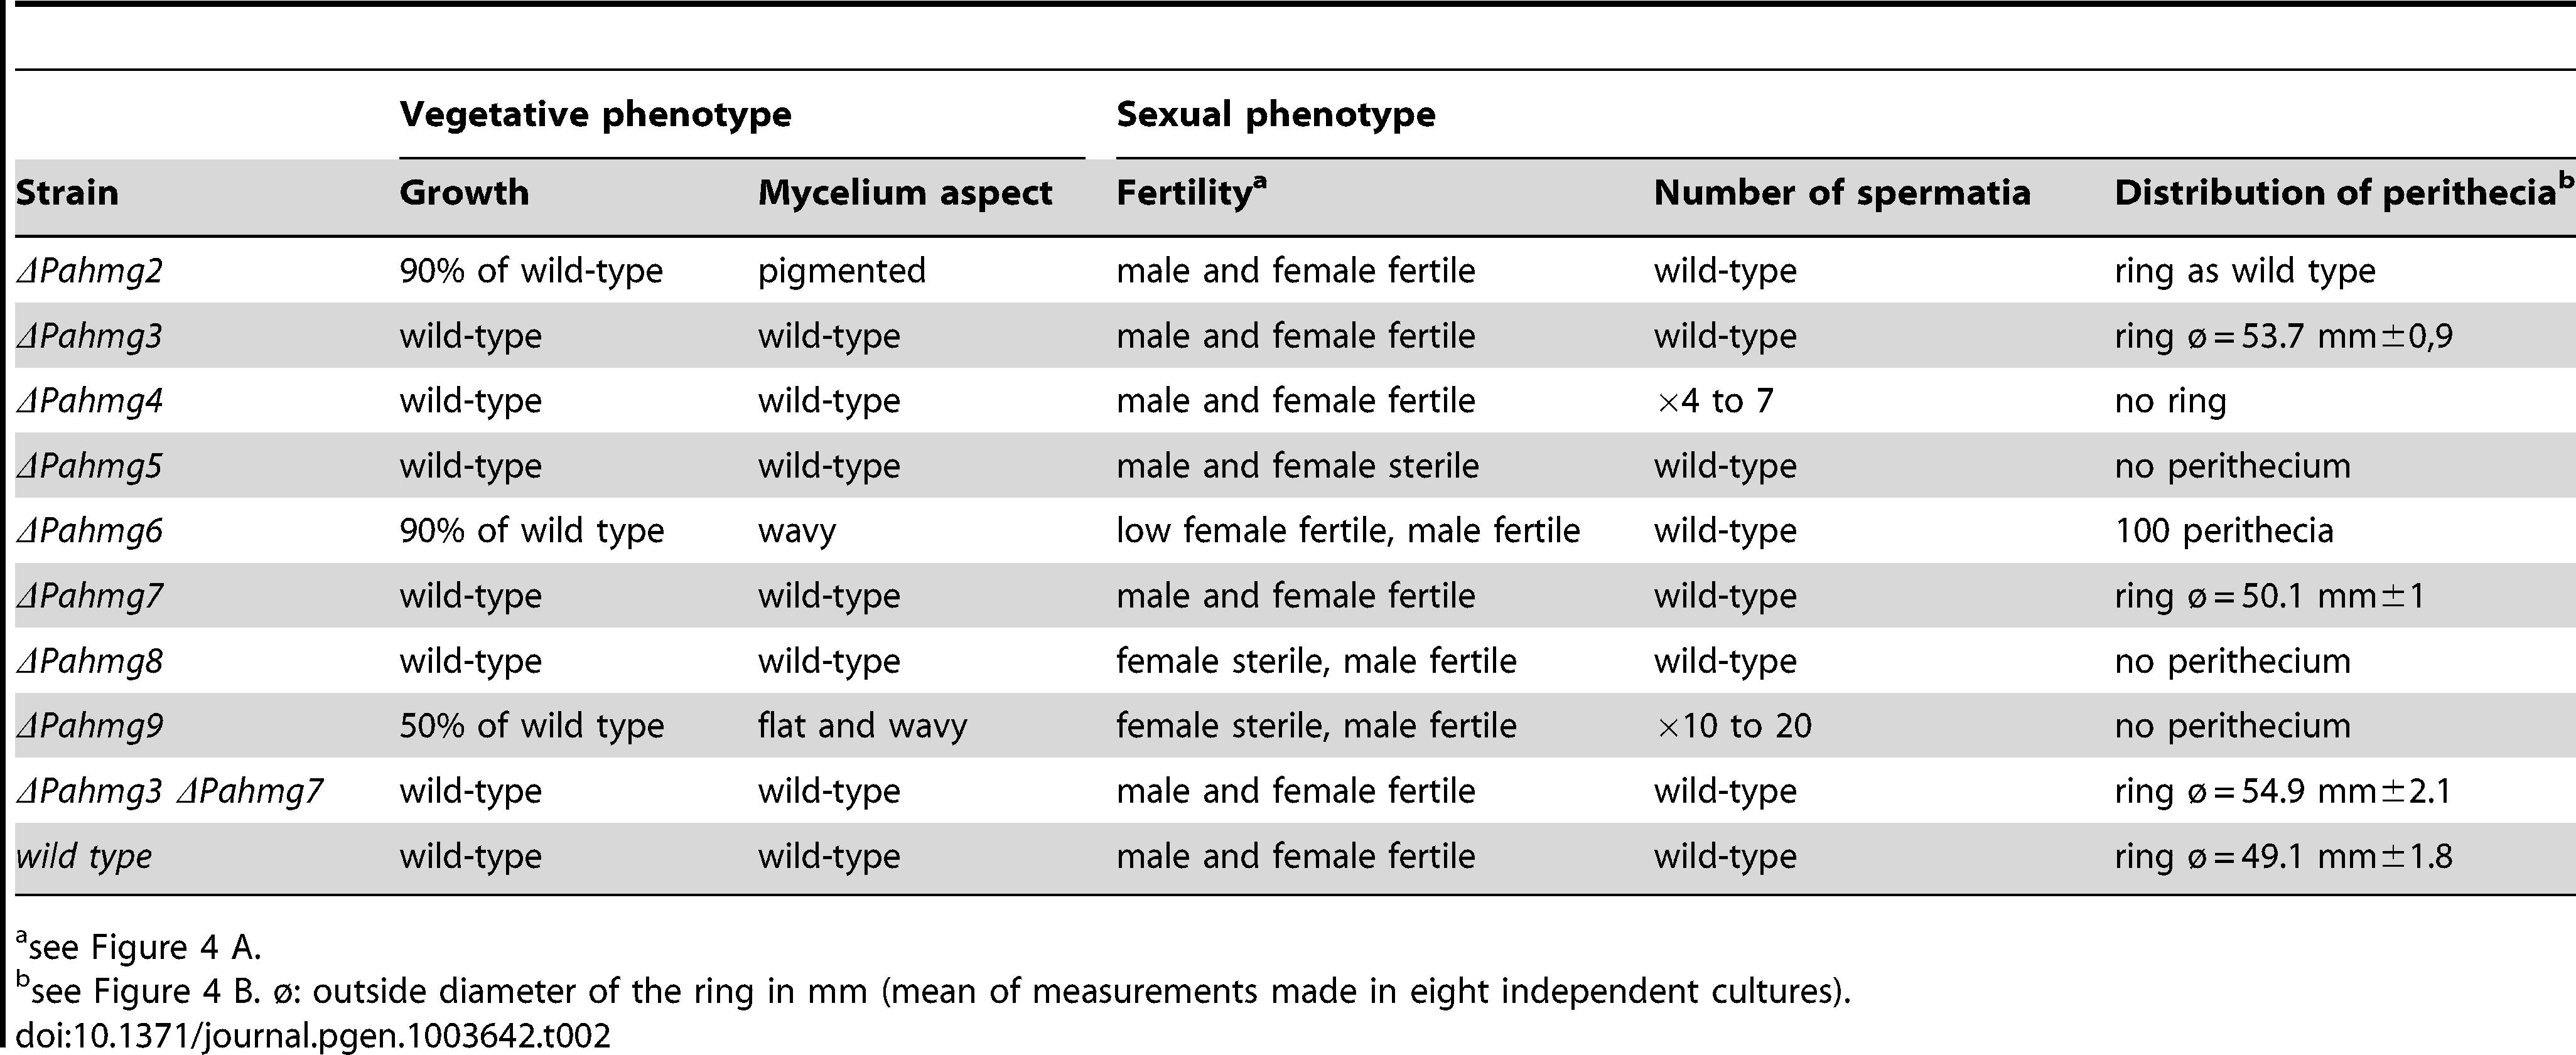 Phenotypes of the <i>P. anserina</i> mutants with deleted HMG-box genes.